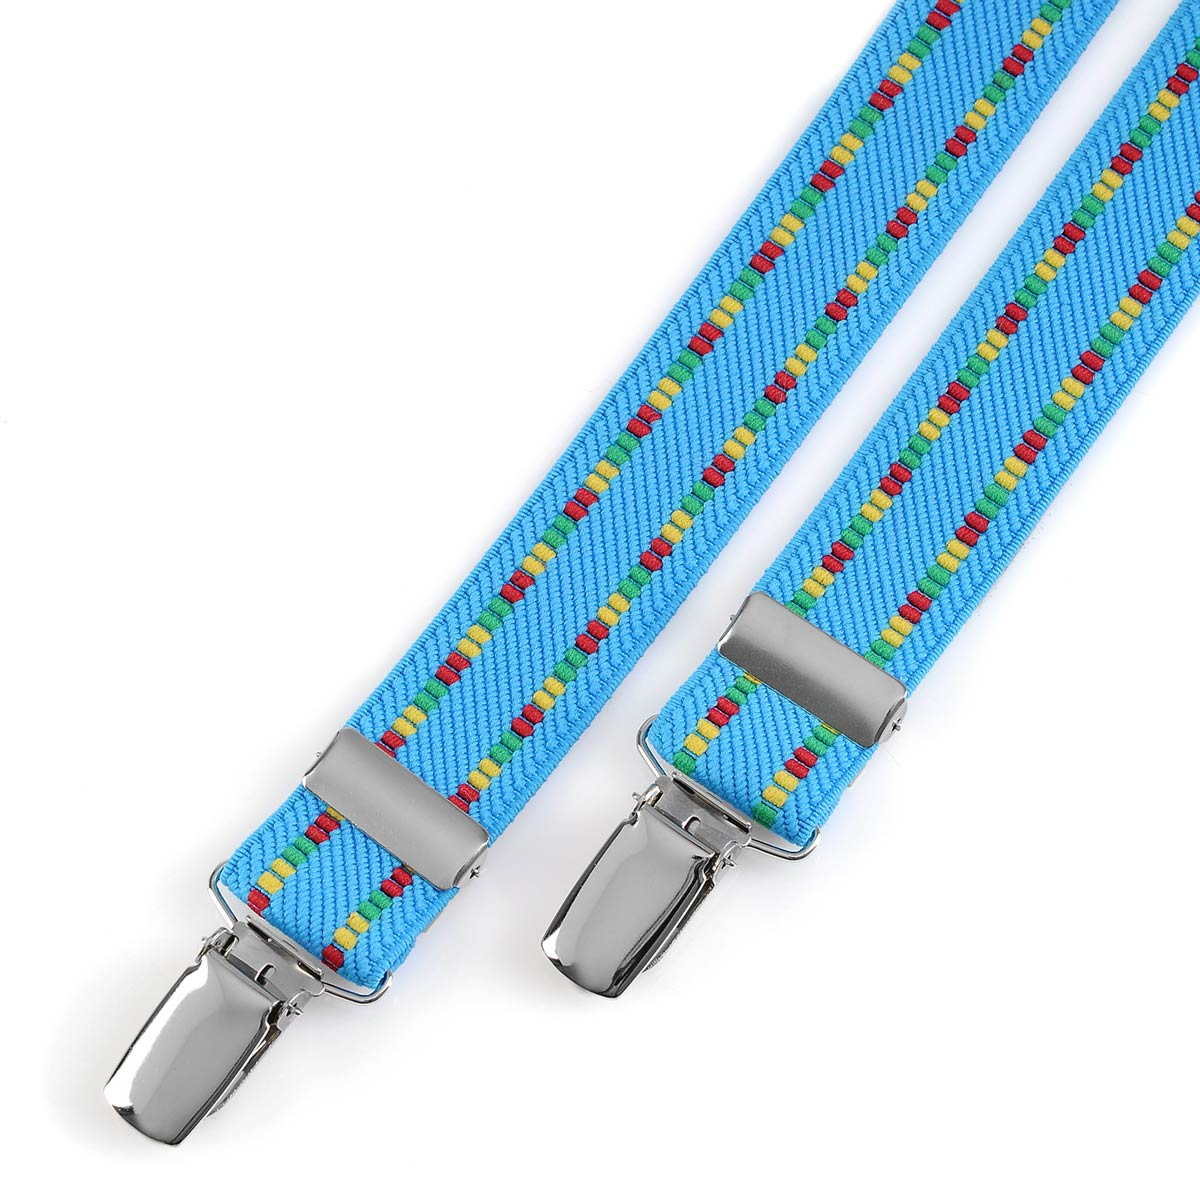 BT-00330_A12-1--_Turquoise-bretelles-homme-slim-x-bleu